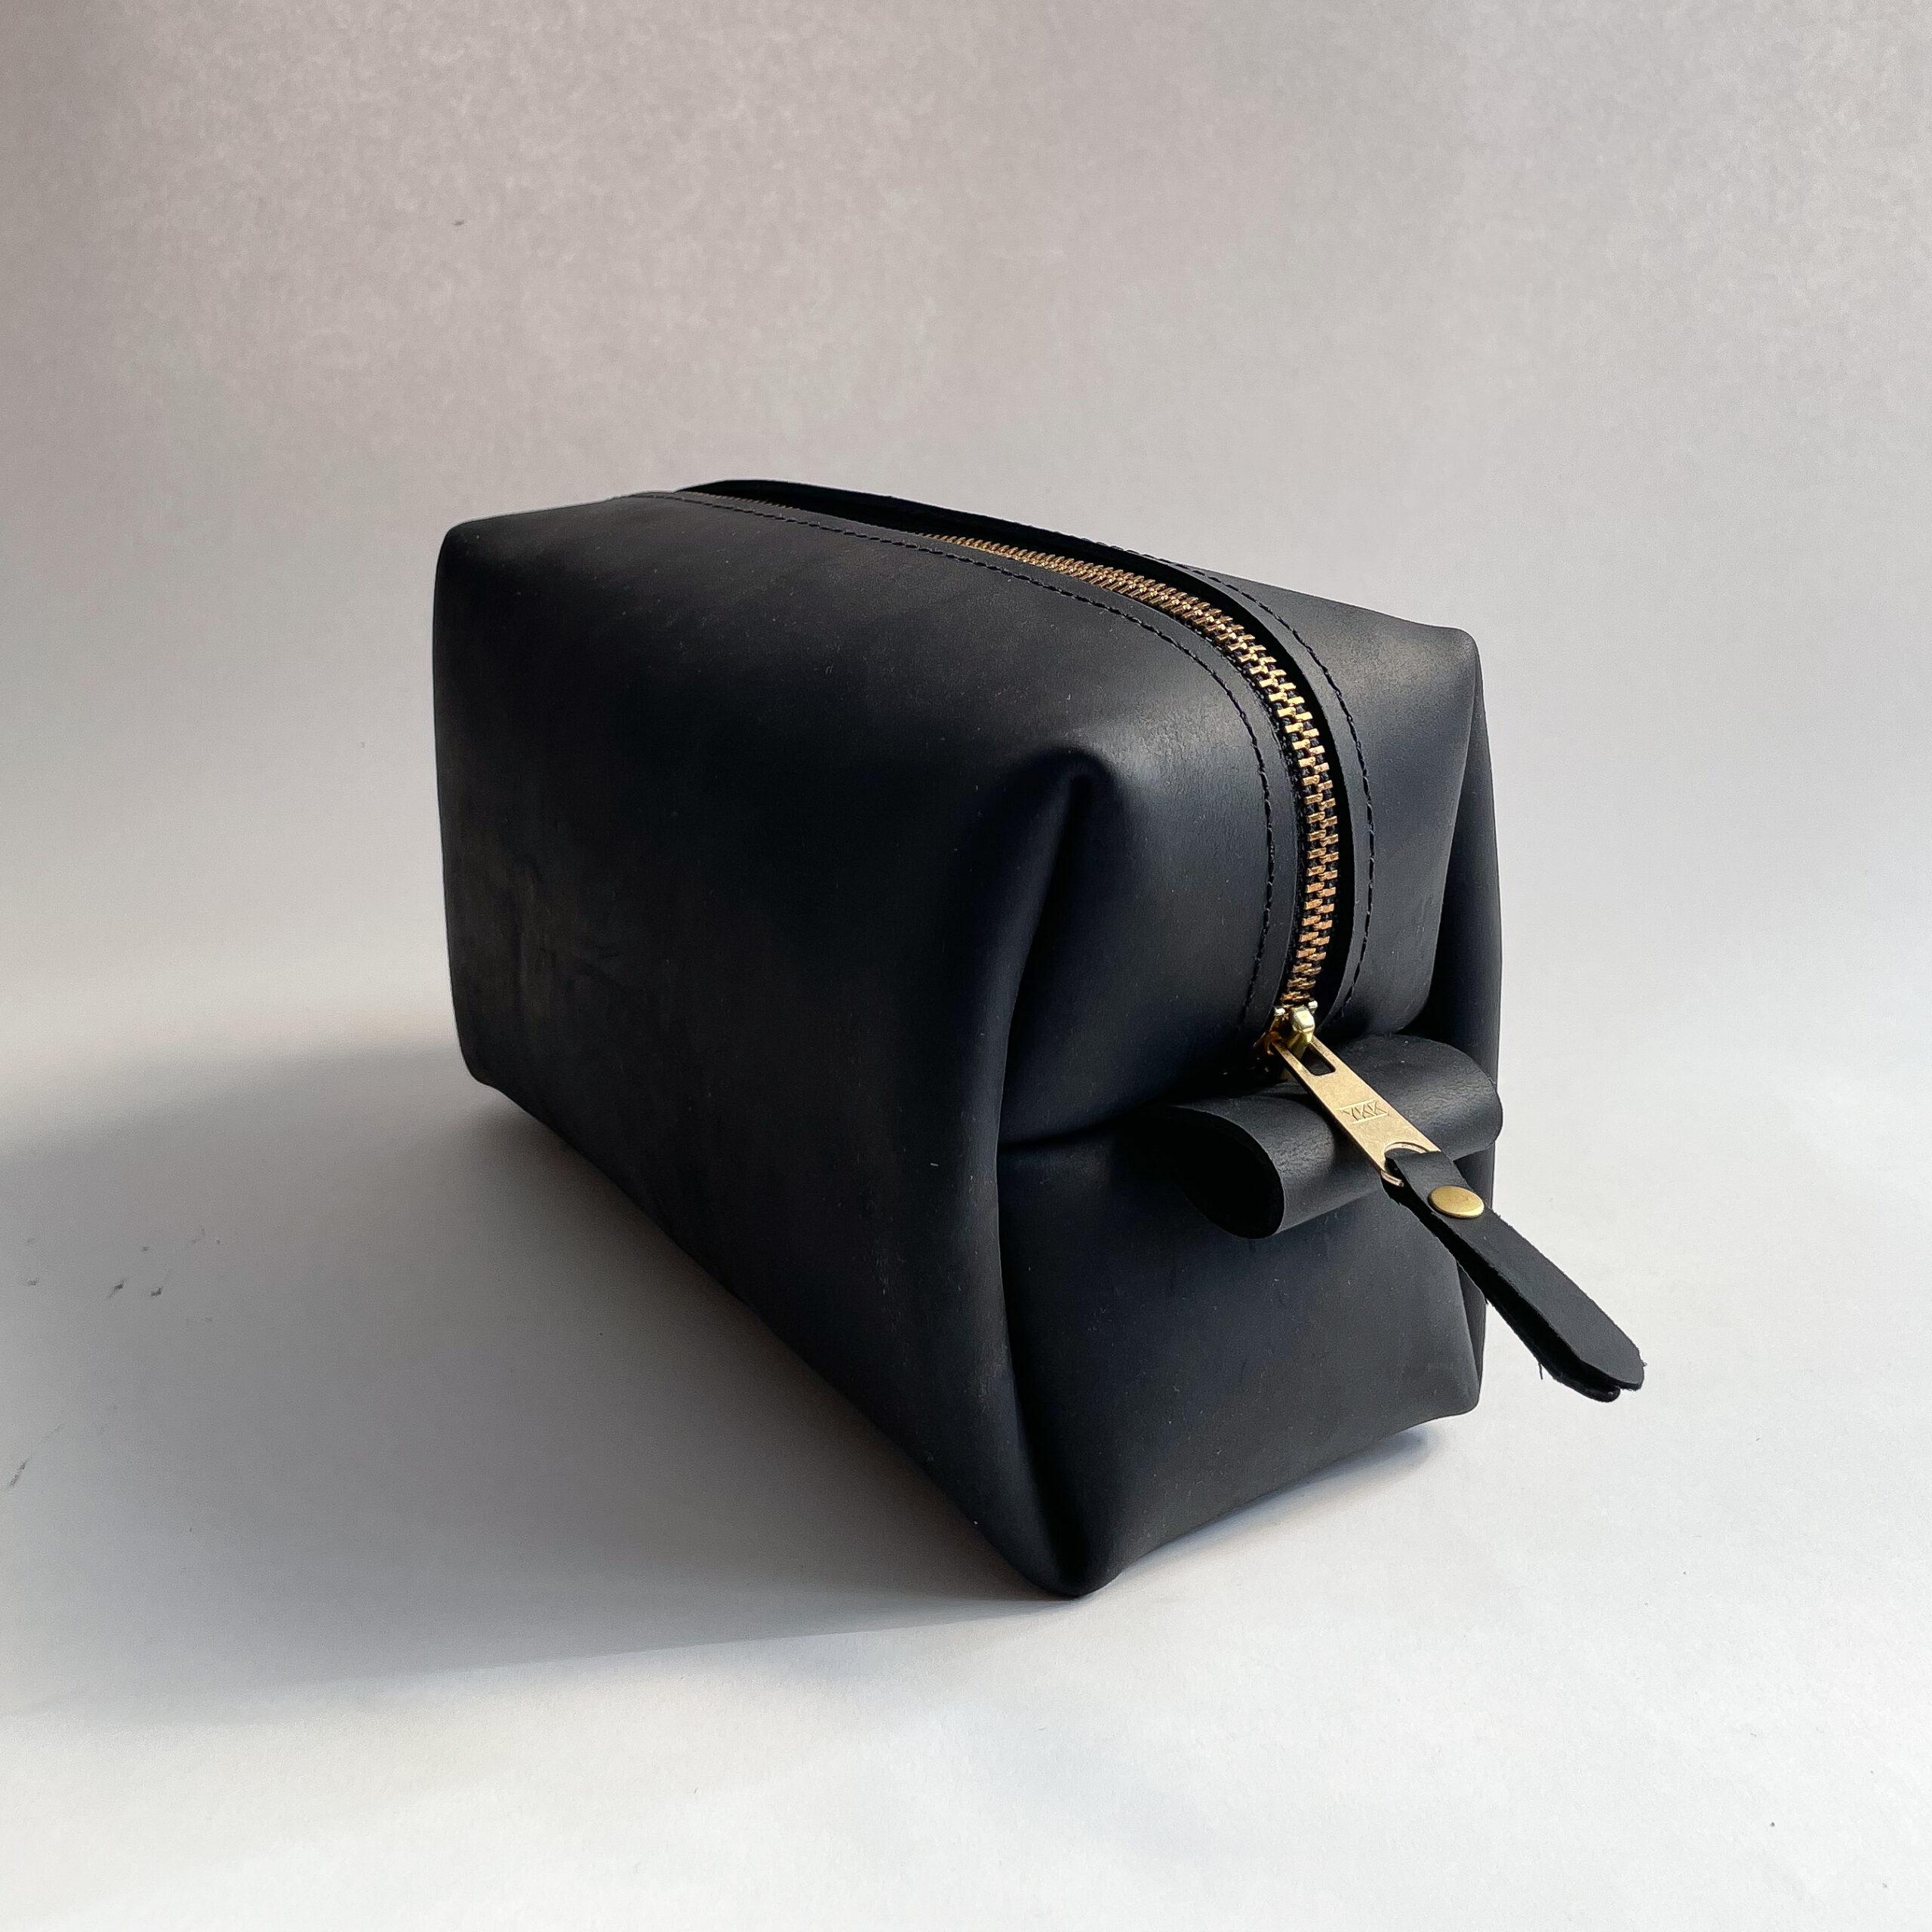 A black leather dopp kit